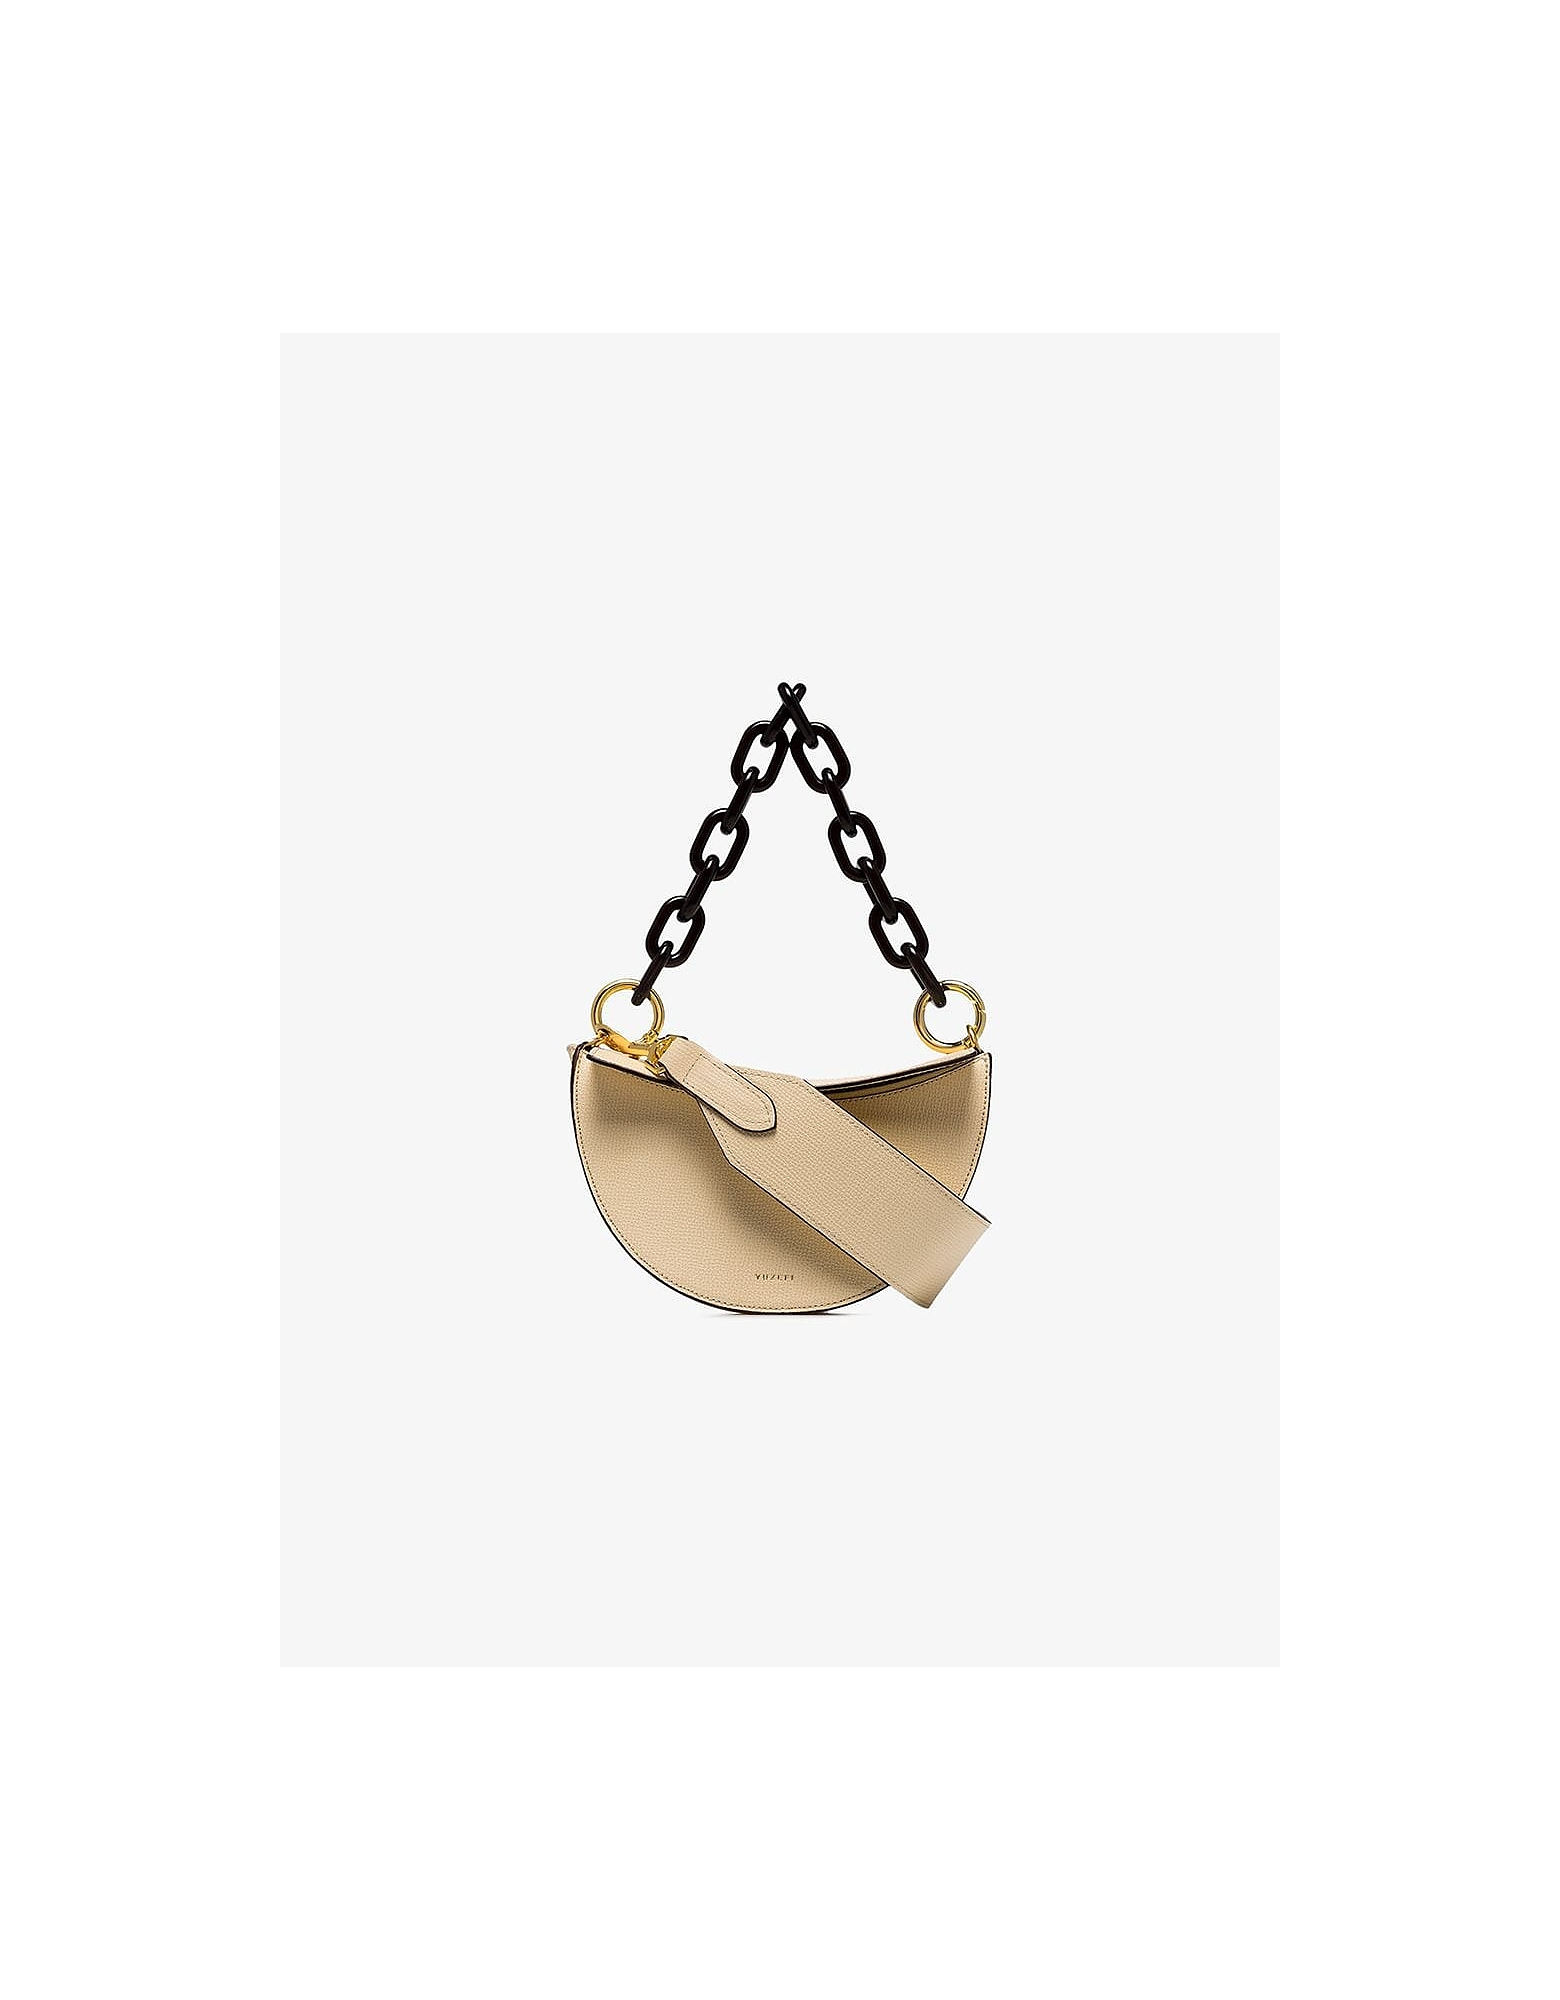 Yuzefi Designer Handbags, Cream Doris Leather Shoulder Bag